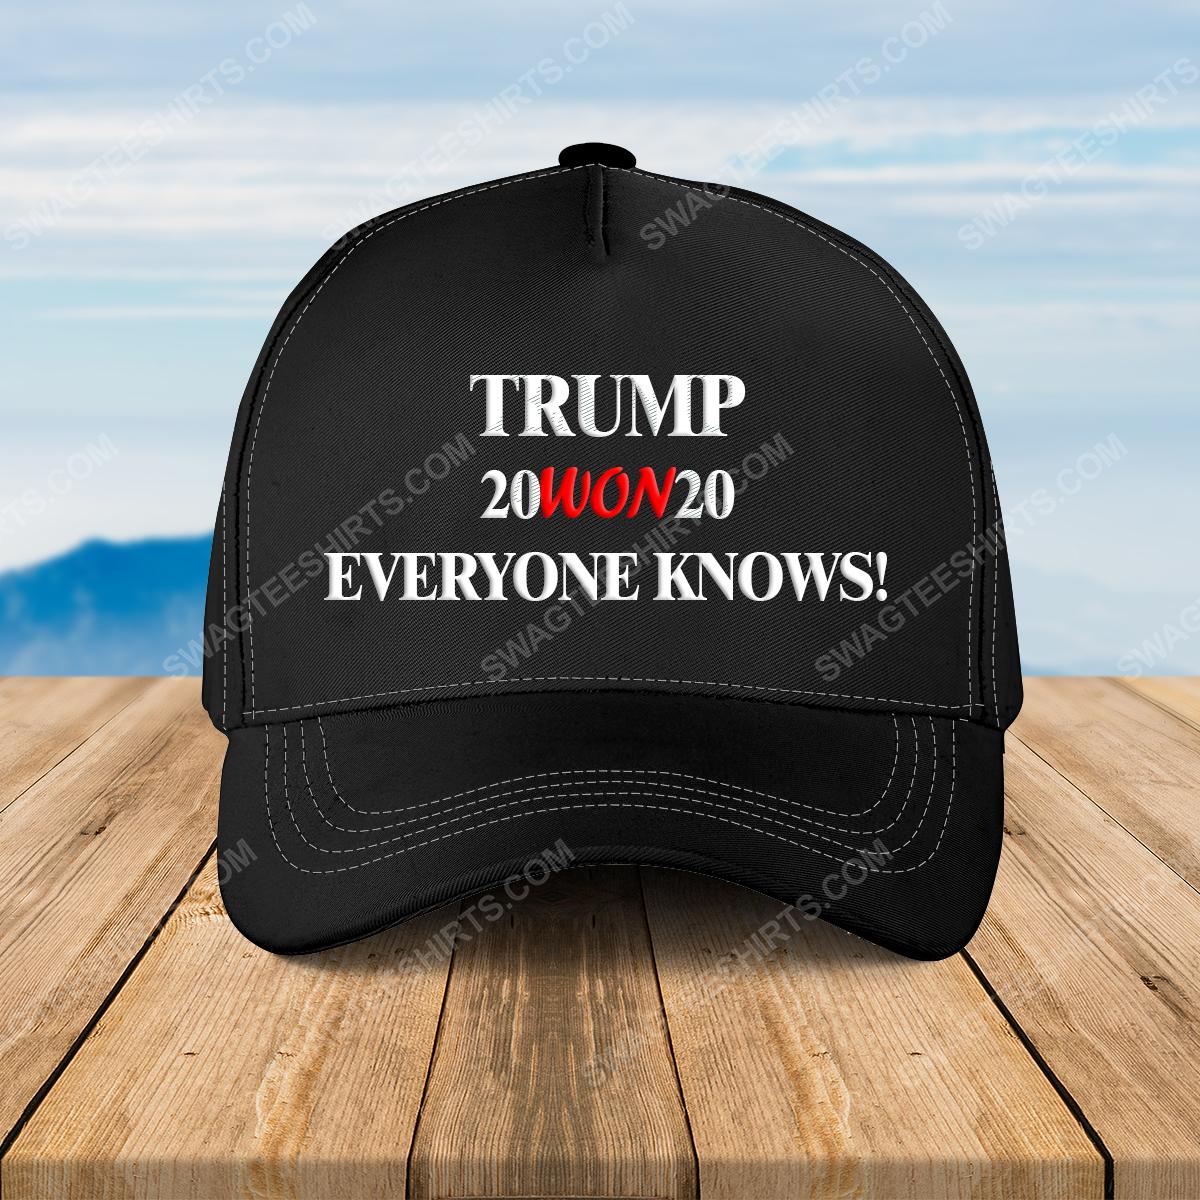 Trump 20won20 everyone american flag full print classic hat 1